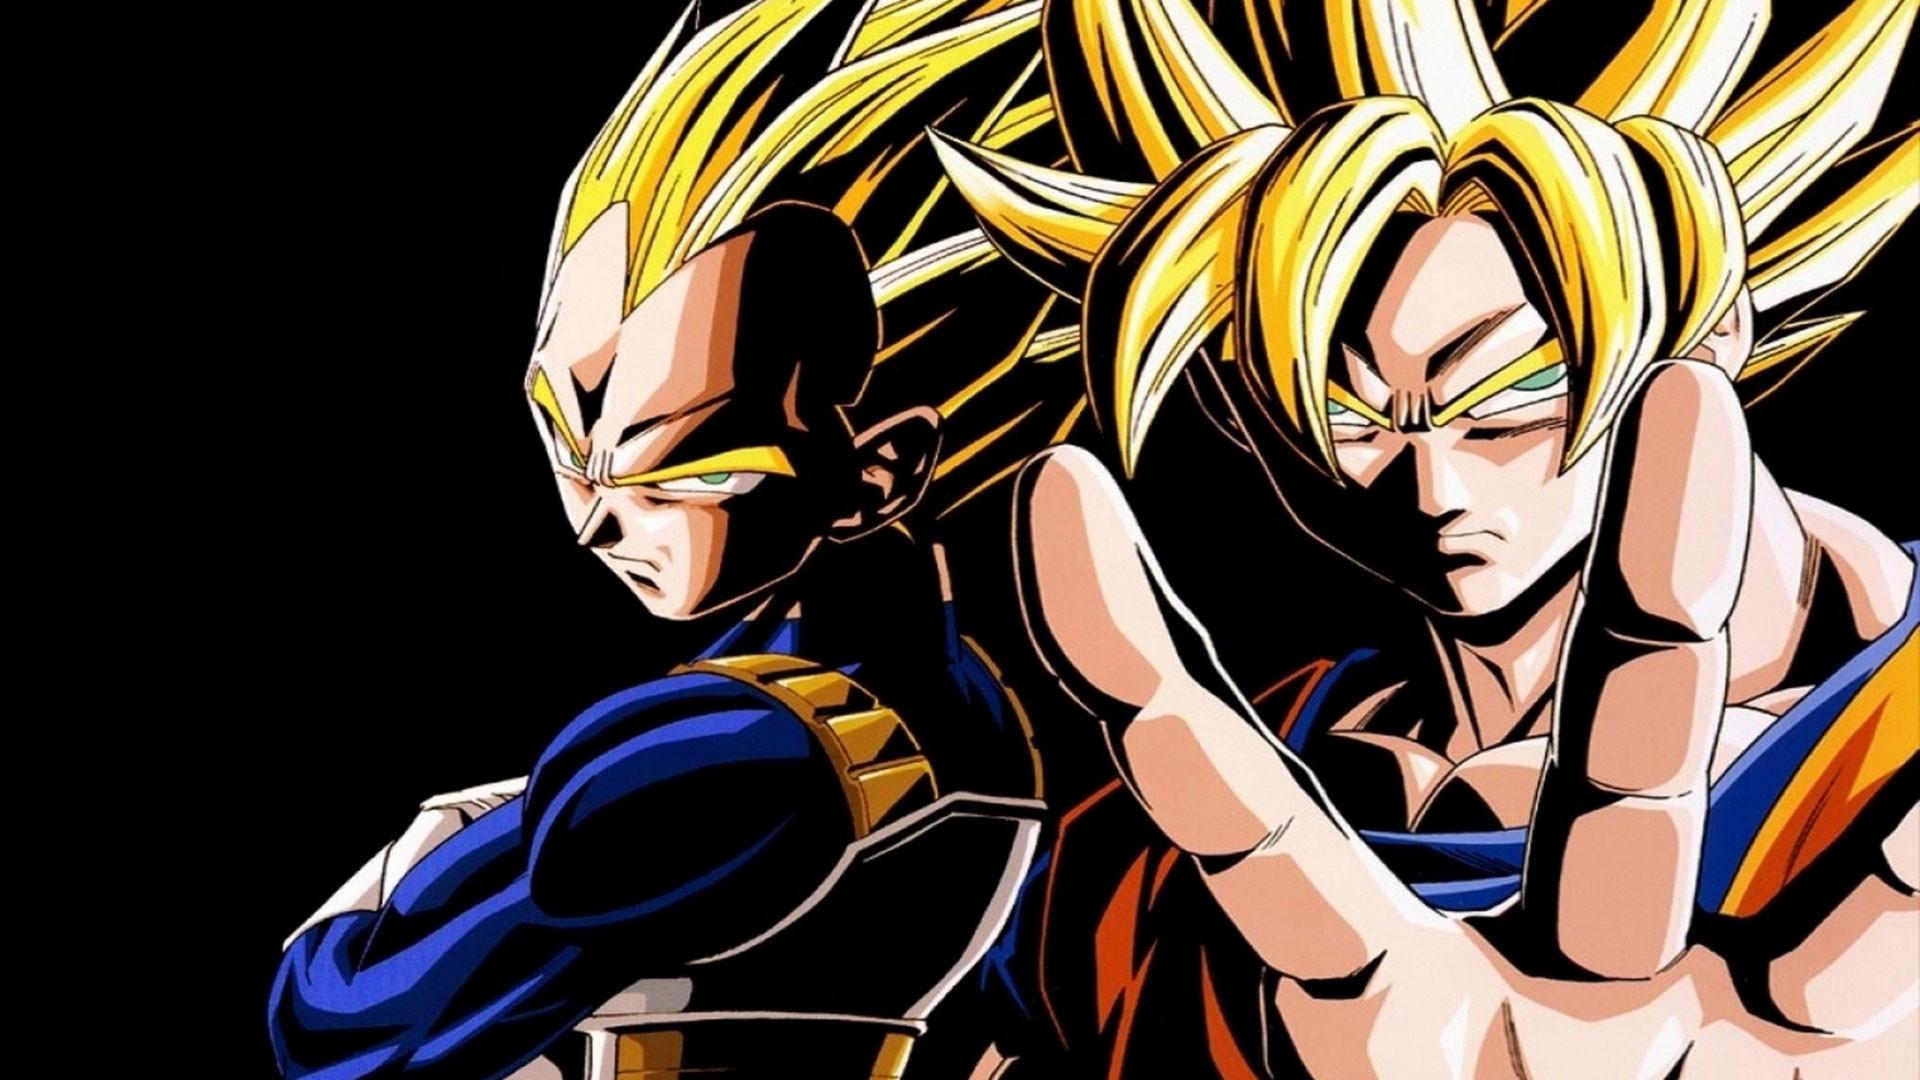 Dragon Ball Z Vegeta & Goku